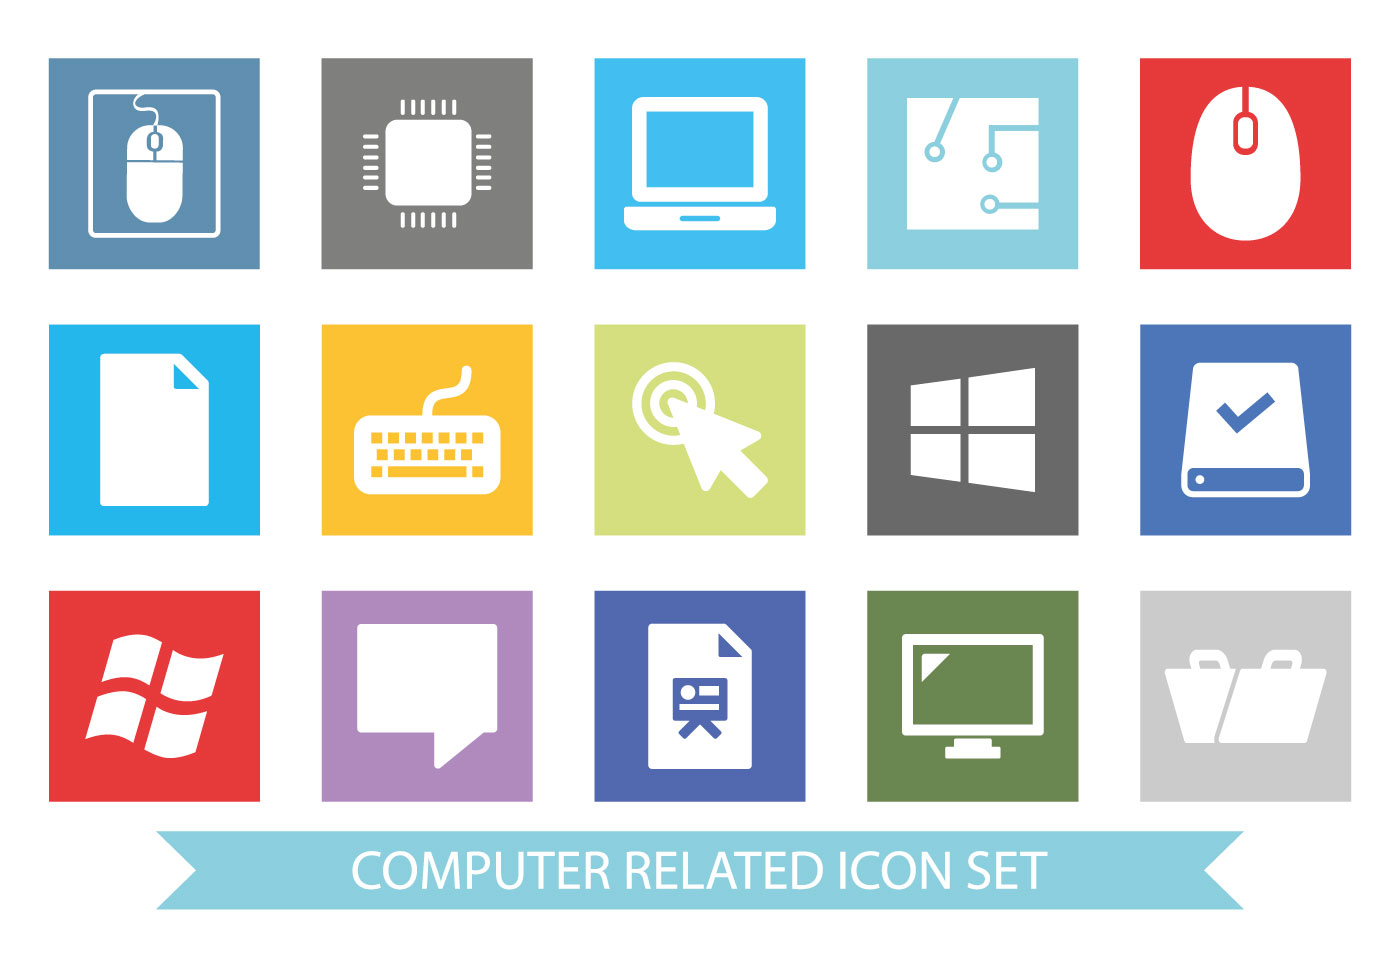 computer accessories icon set download free vector art